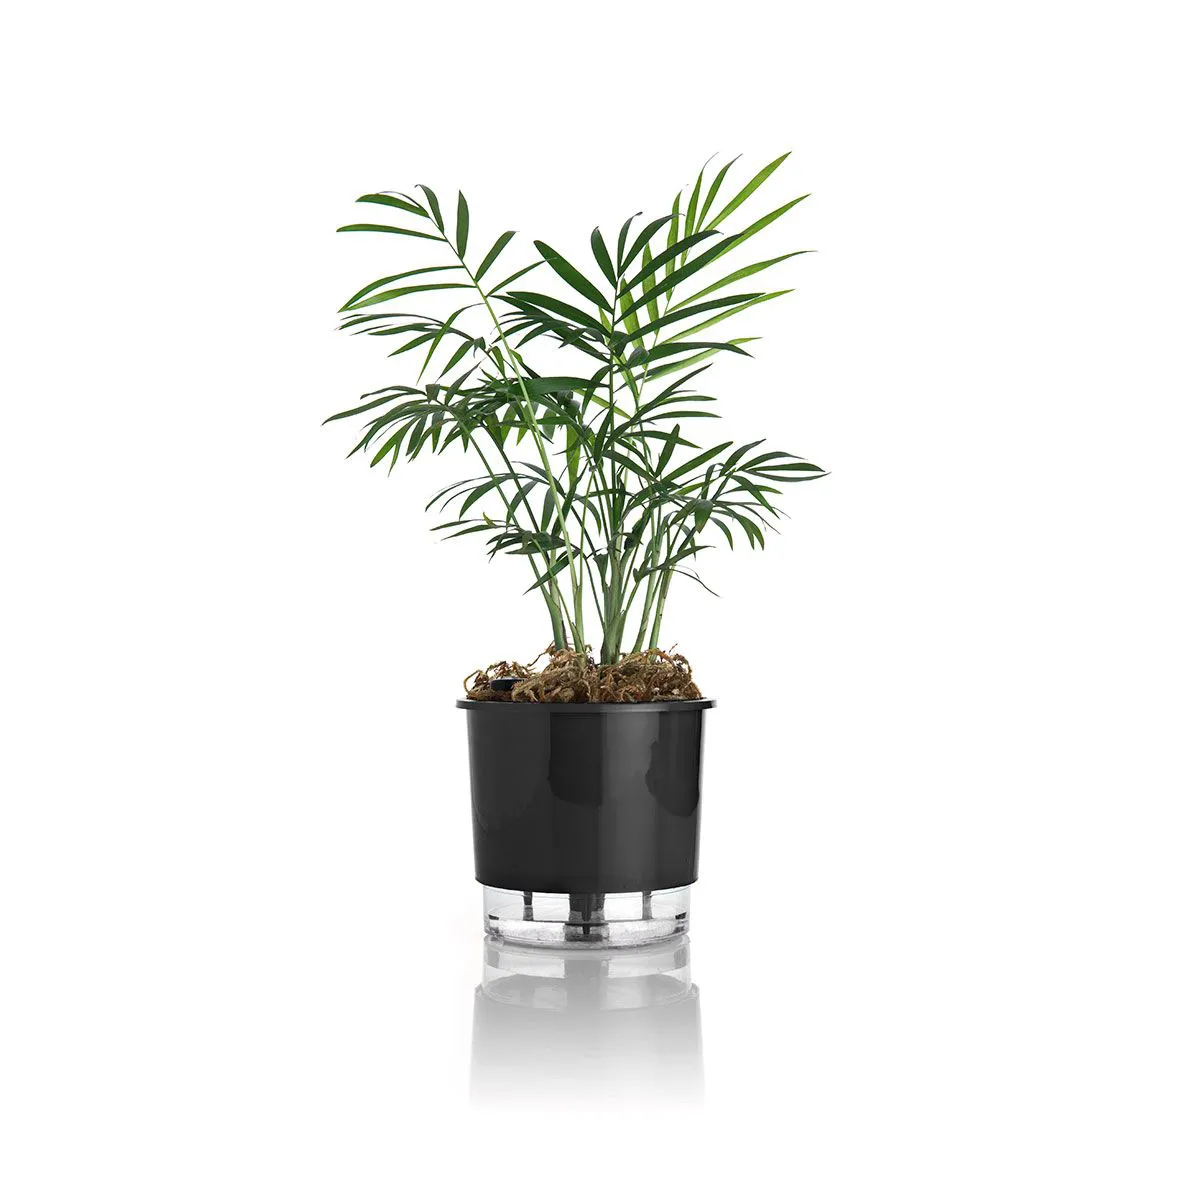 Vaso Autoirrigável Médio 16cm x 14cm Preto N03  - Vasos Raiz Loja Oficial